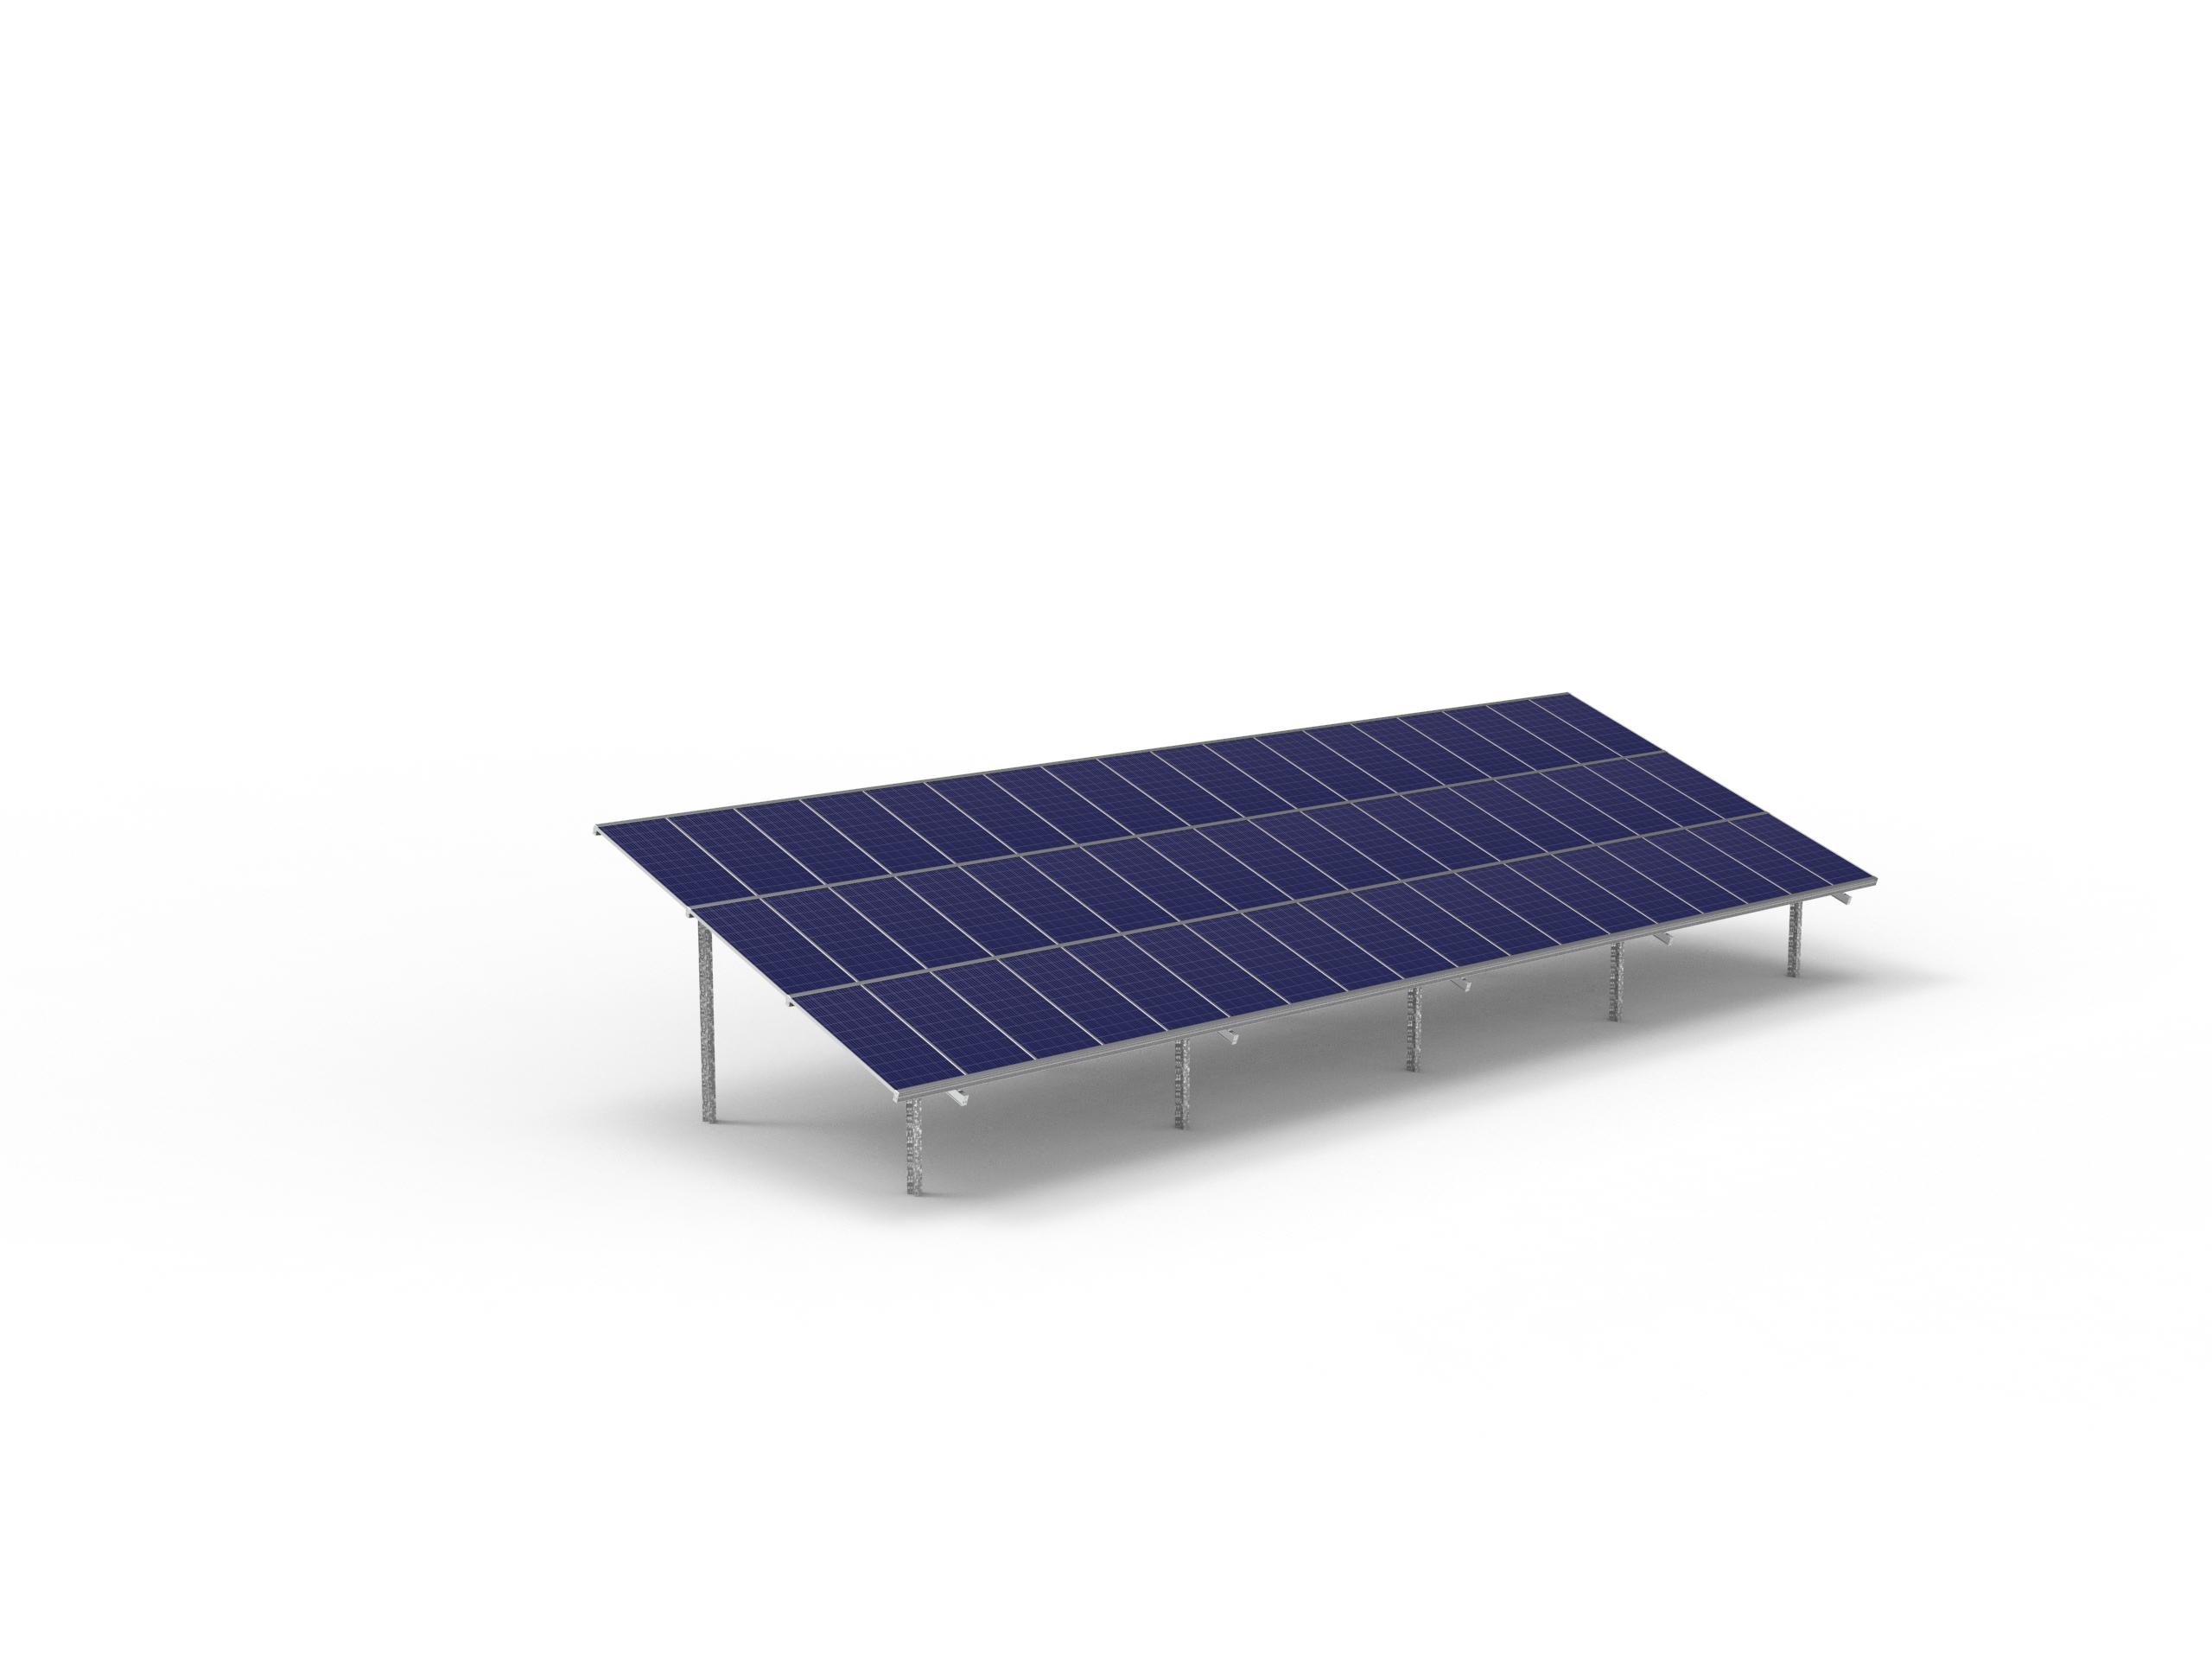 54 module Max solar ground mount table